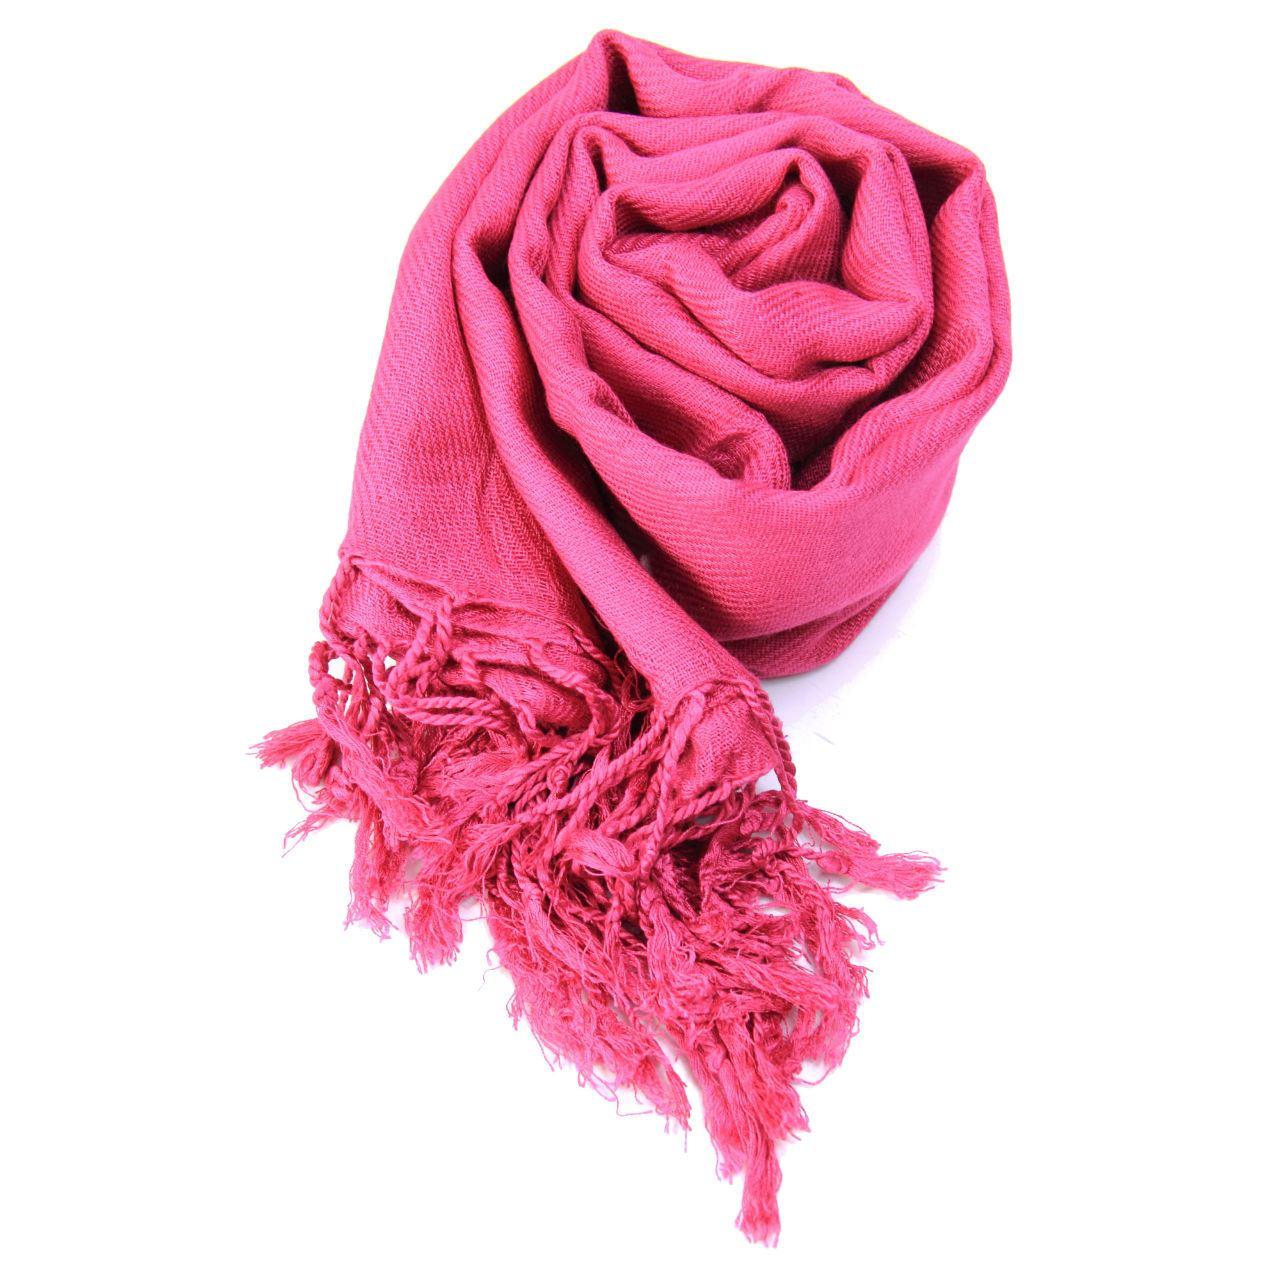 Women-Ladies-Neck-Scarf-Plain-Pashmina-Shawl-Hijab-Wrap-Top-Quality-100-Viscose